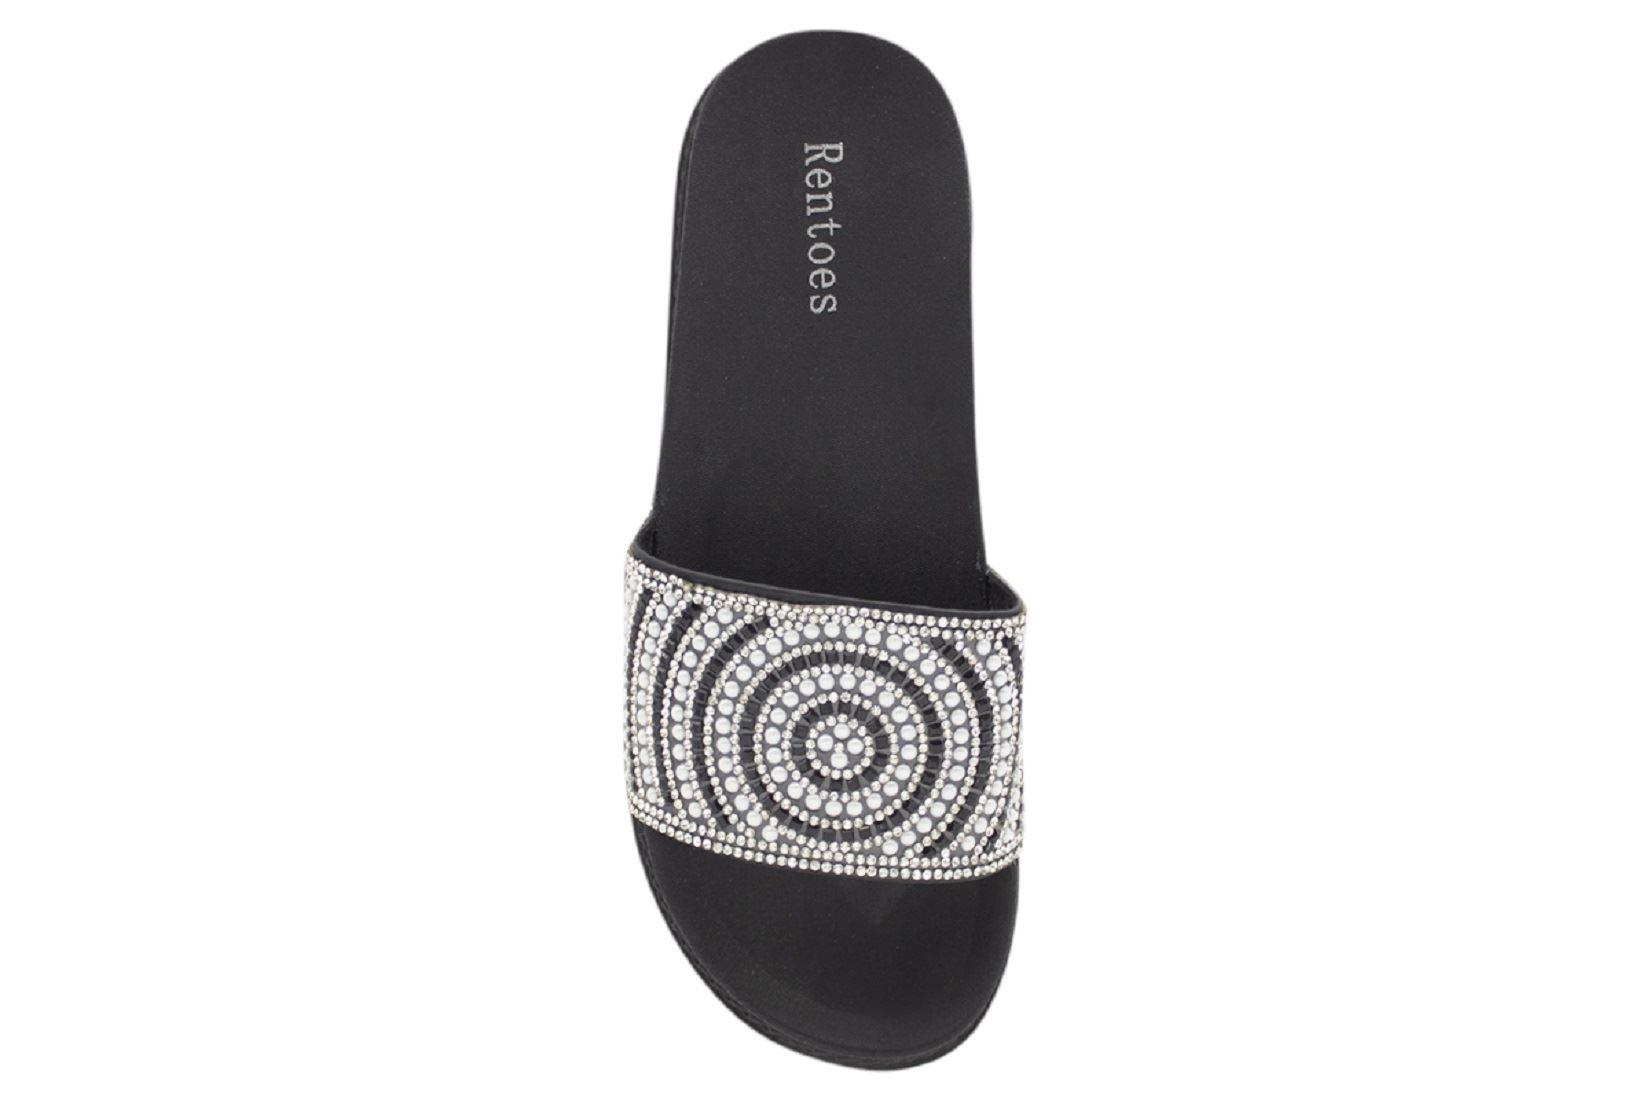 Womens-Sliders-Casual-Slippers-Mules-Ladies-Diamante-Flip-Flop-Sandals-Shoes thumbnail 55